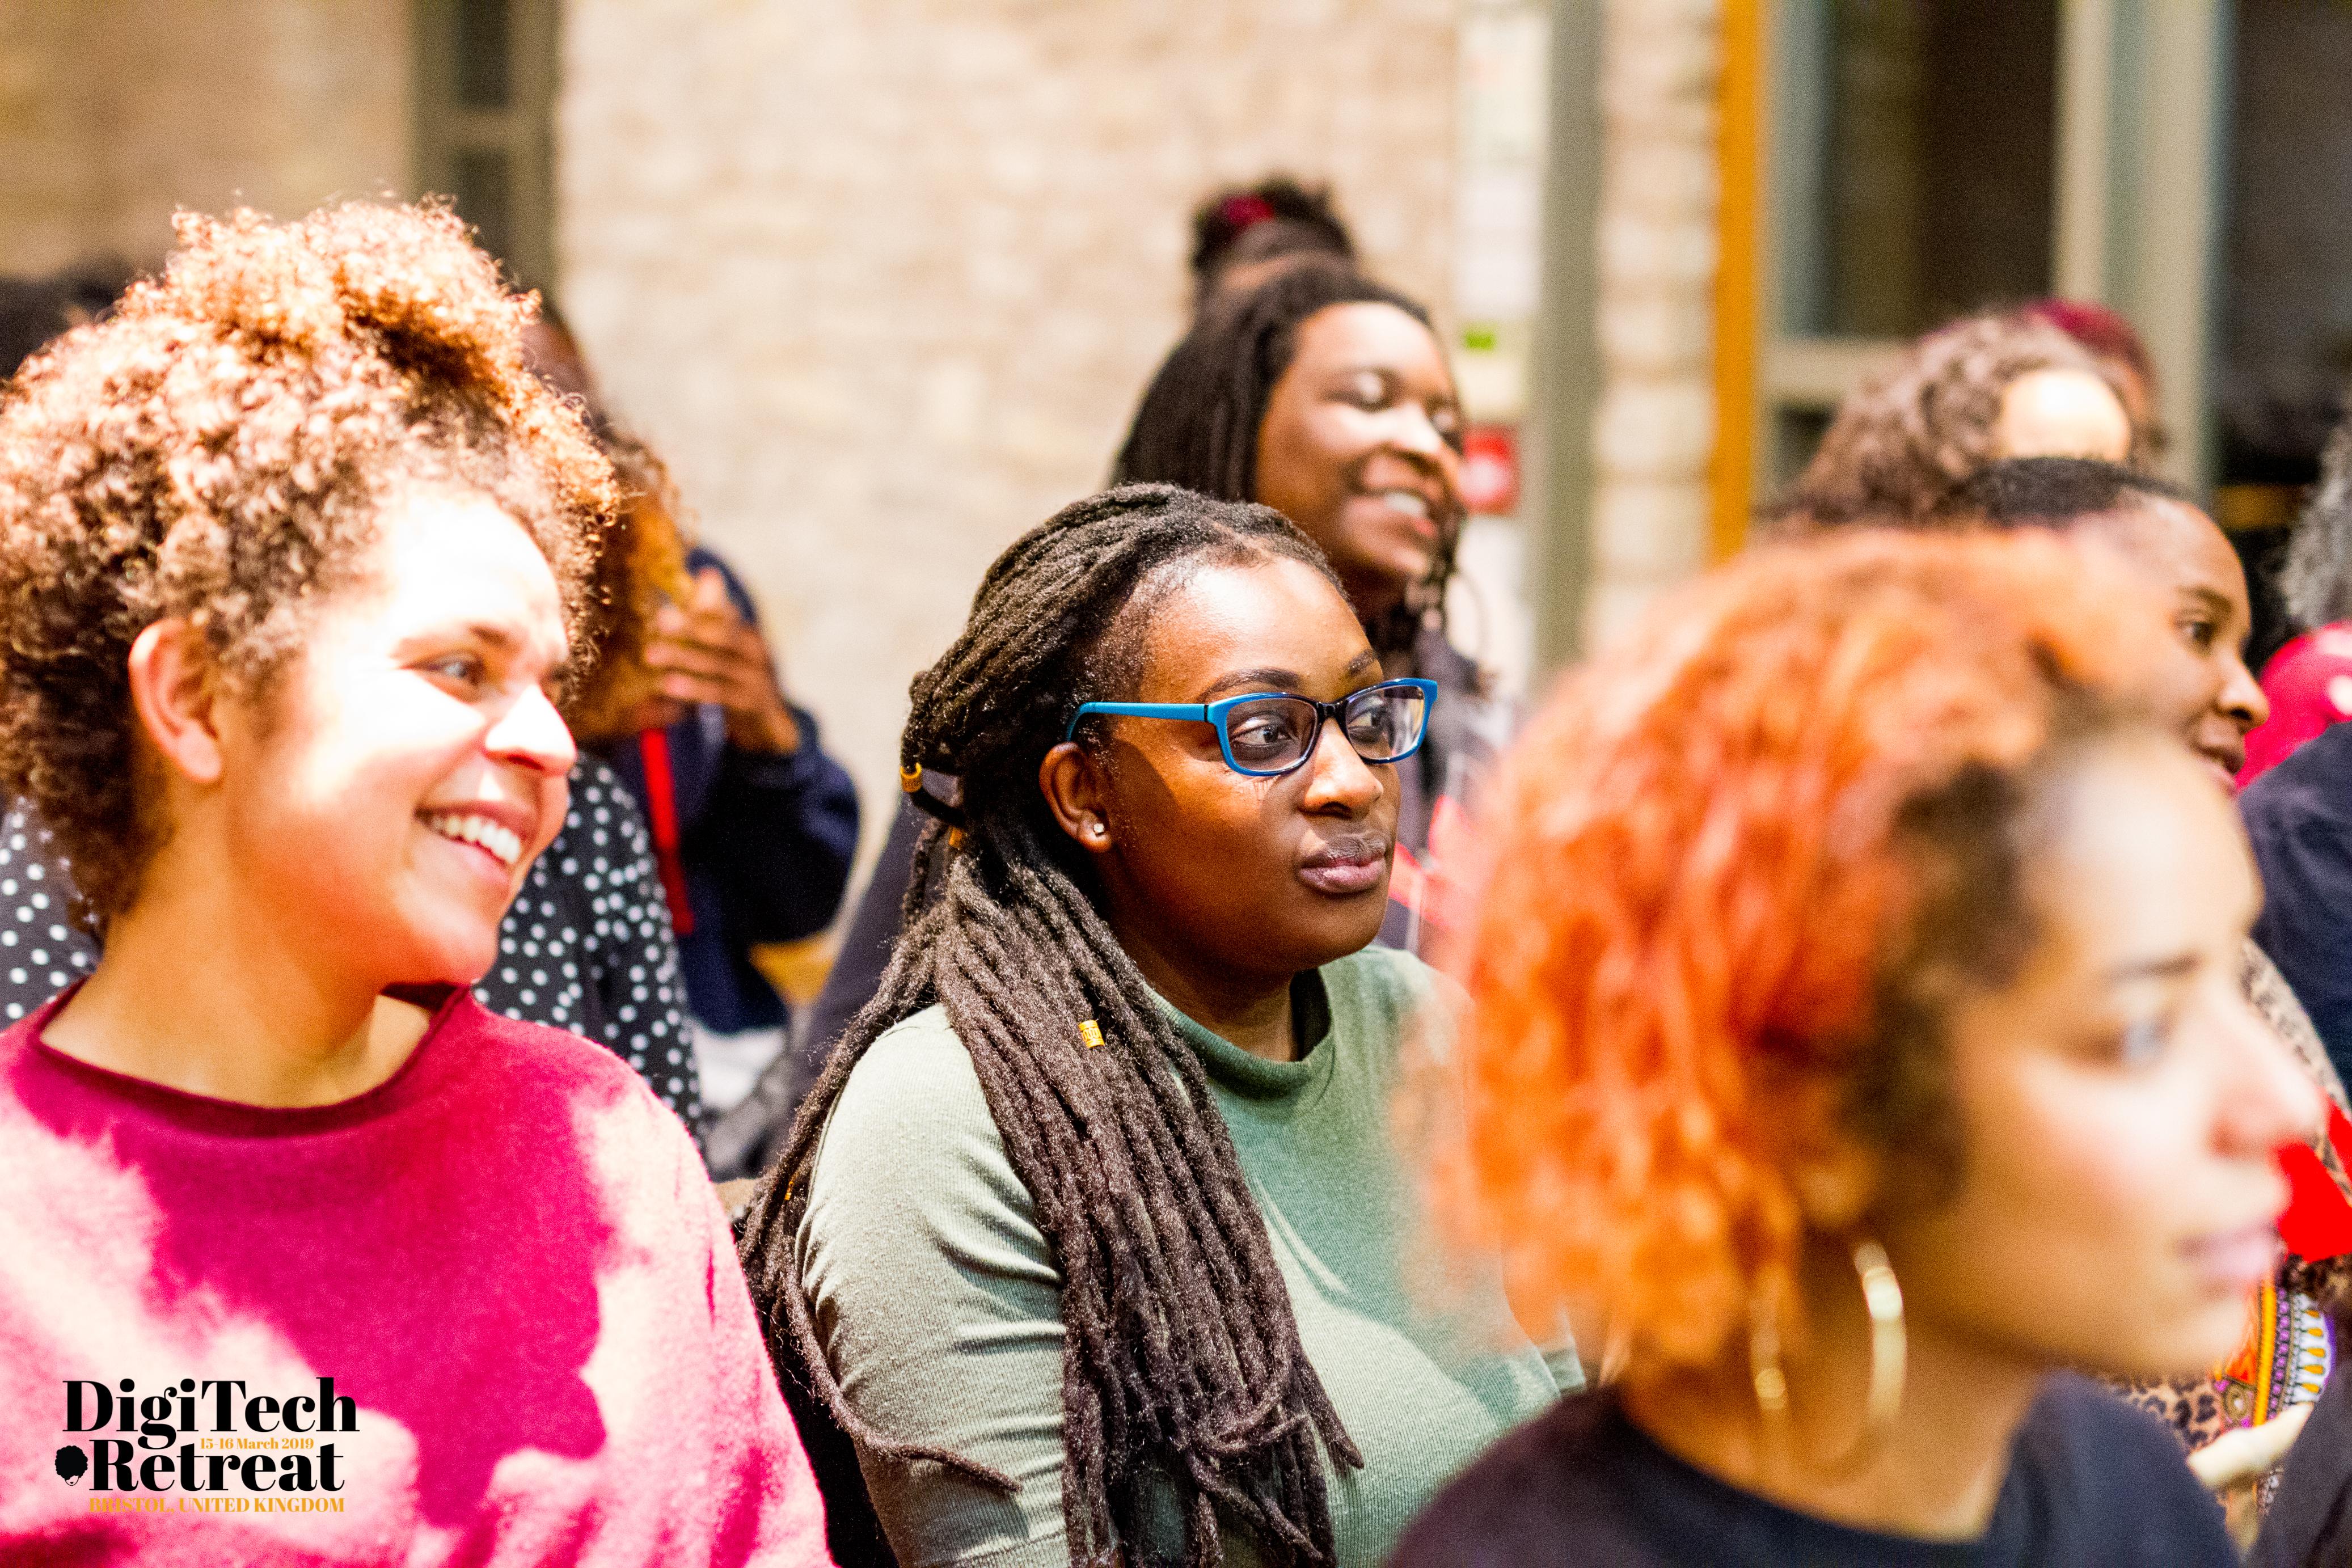 Spotlight on: The inaugural Black Girl Convention DigiTech Retreat